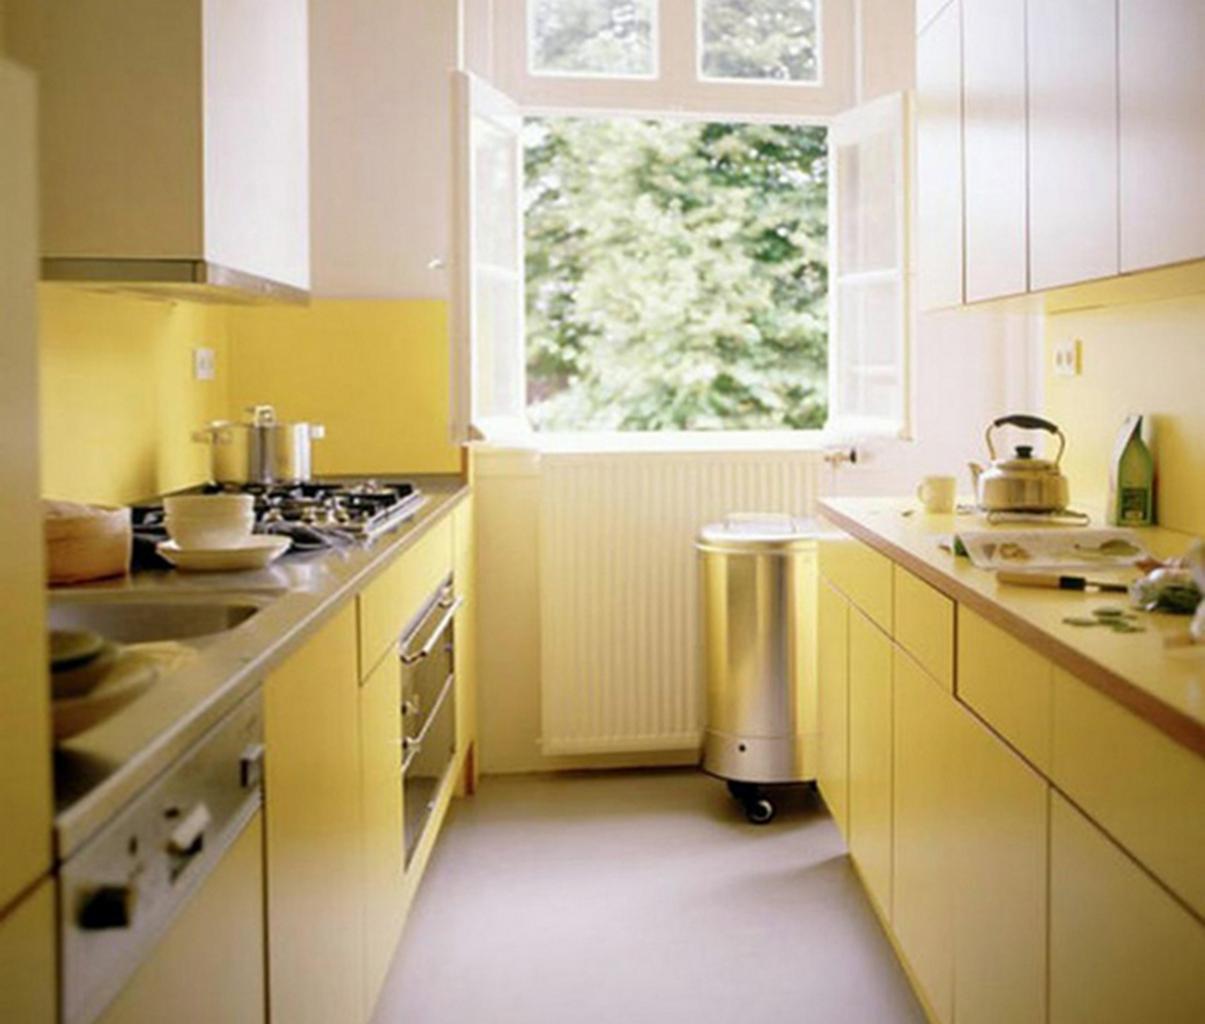 дизайн кухни 12 кв м фото новинки двухрядная